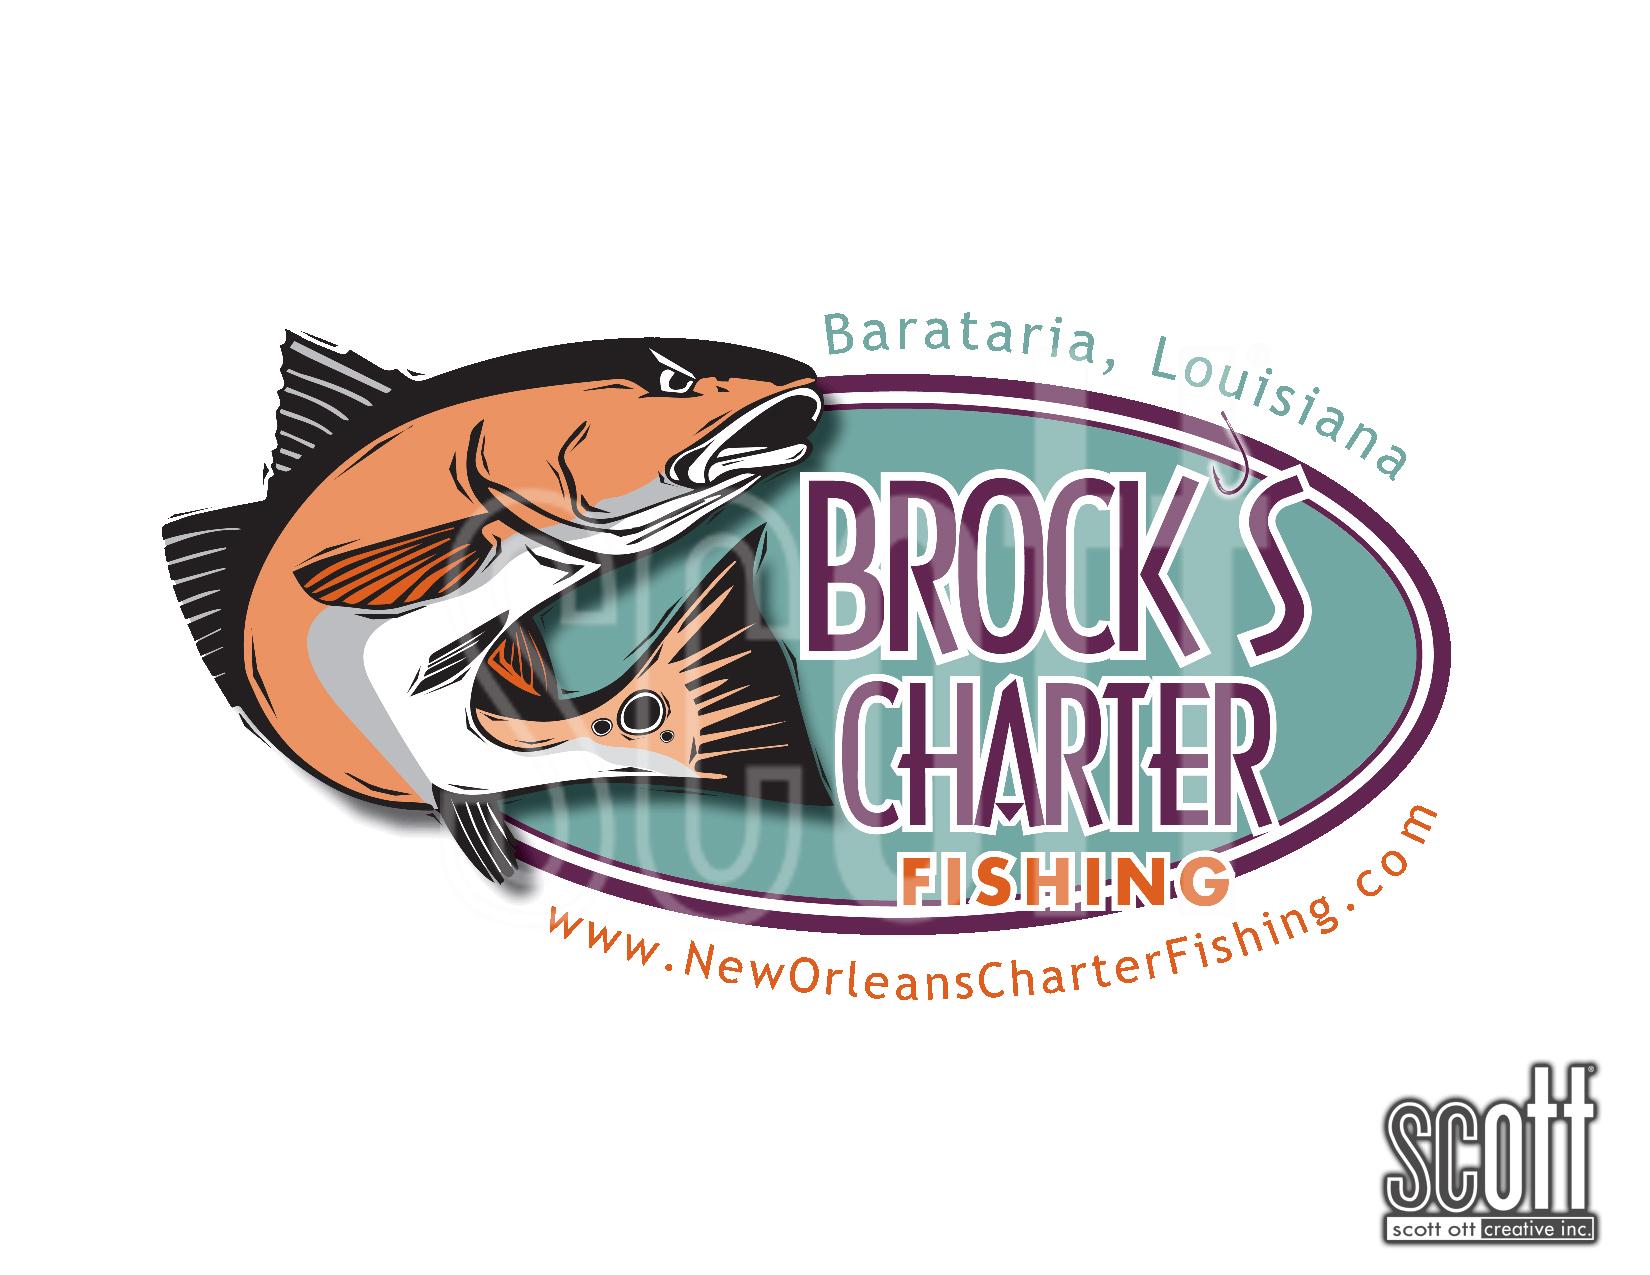 Brock's Charter Fishing OVAL COLOR